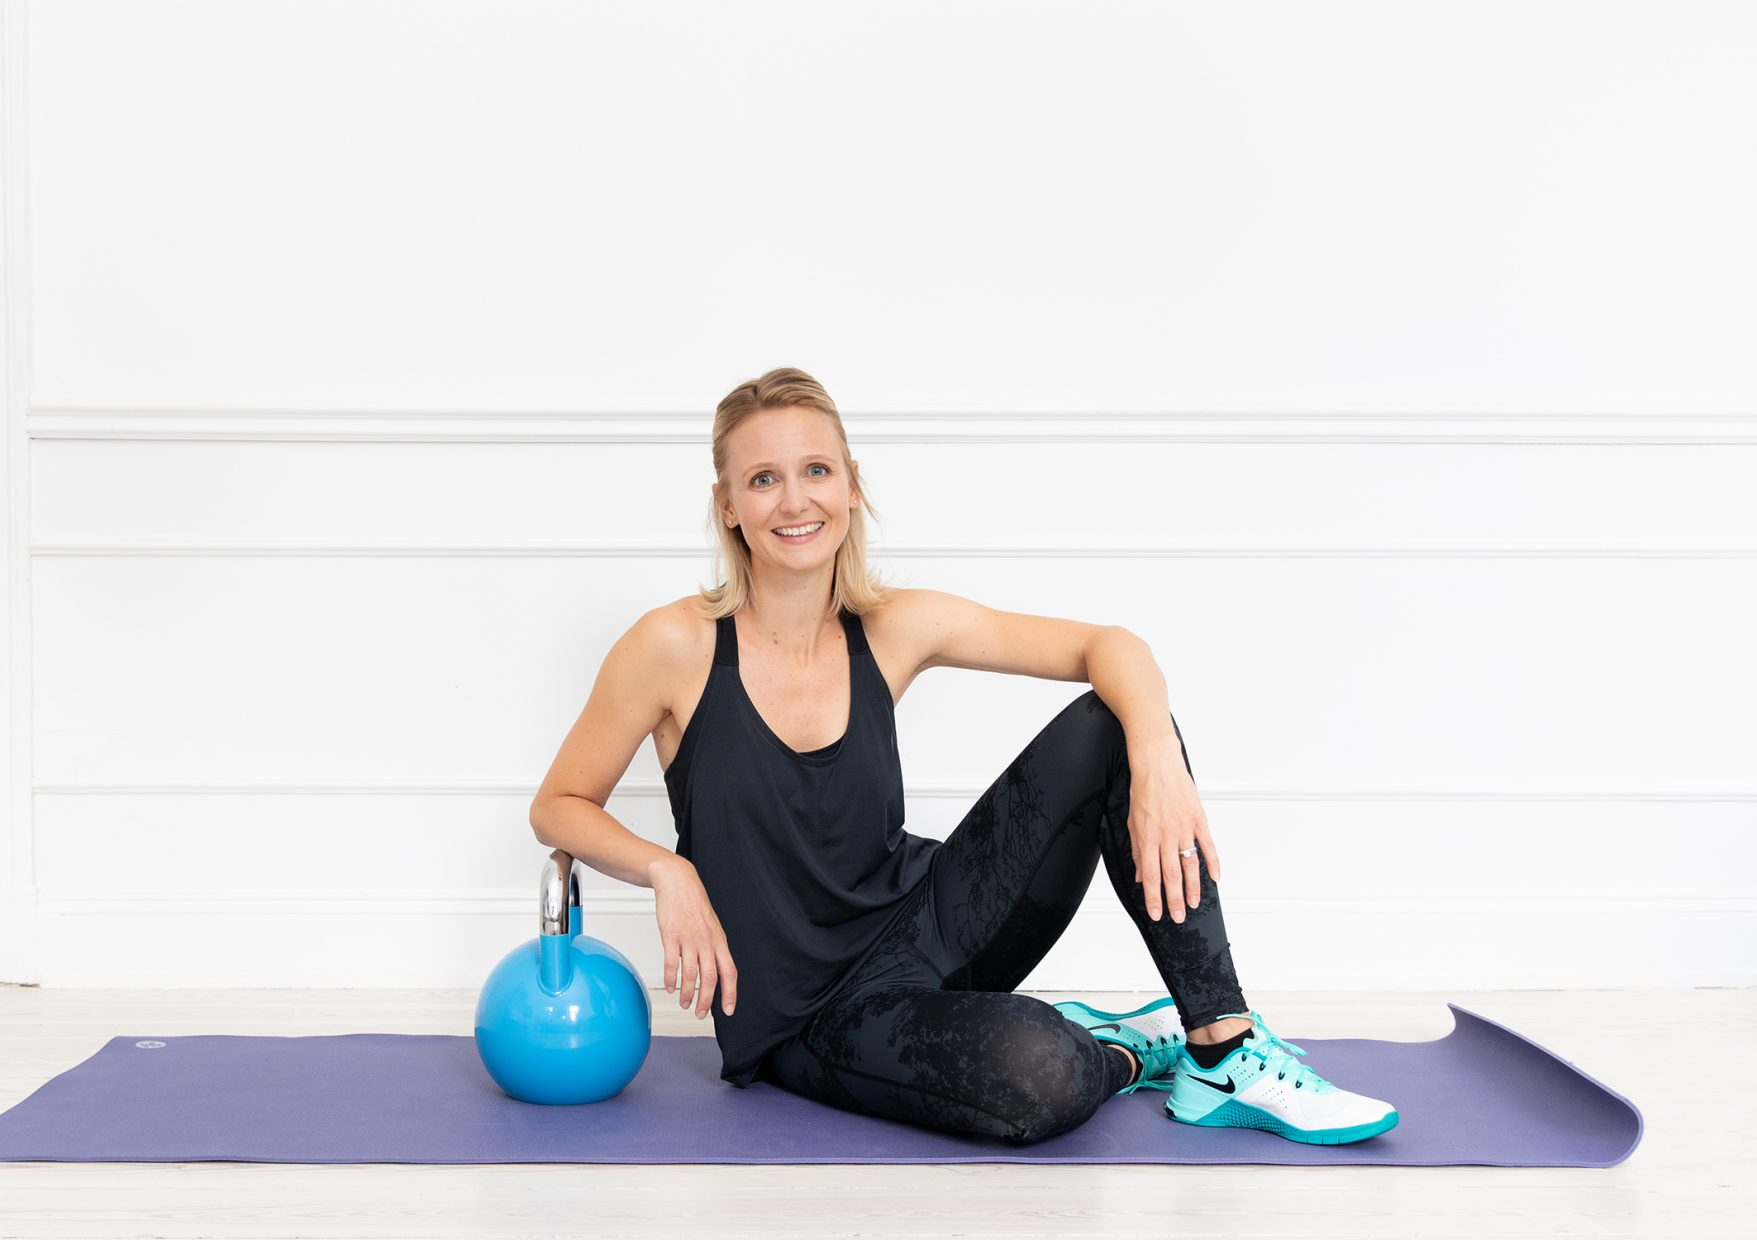 fitness branding stockholm sweden